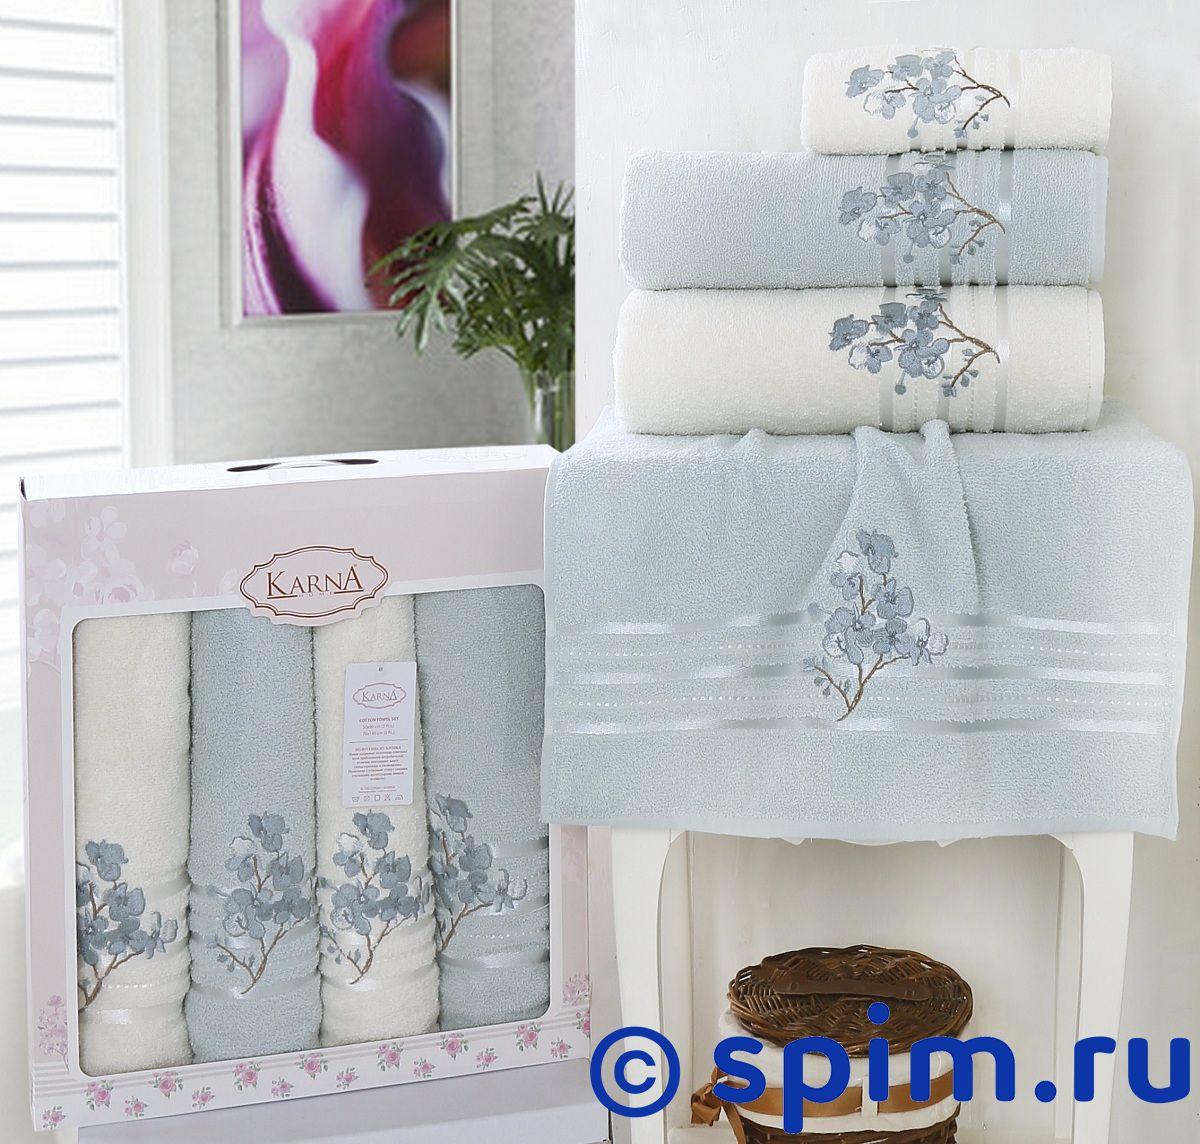 Комплект полотенец Karna Papilon, ментол арт. 2355/char002 комплект полотенец karna victory бордовый арт 2386 char002